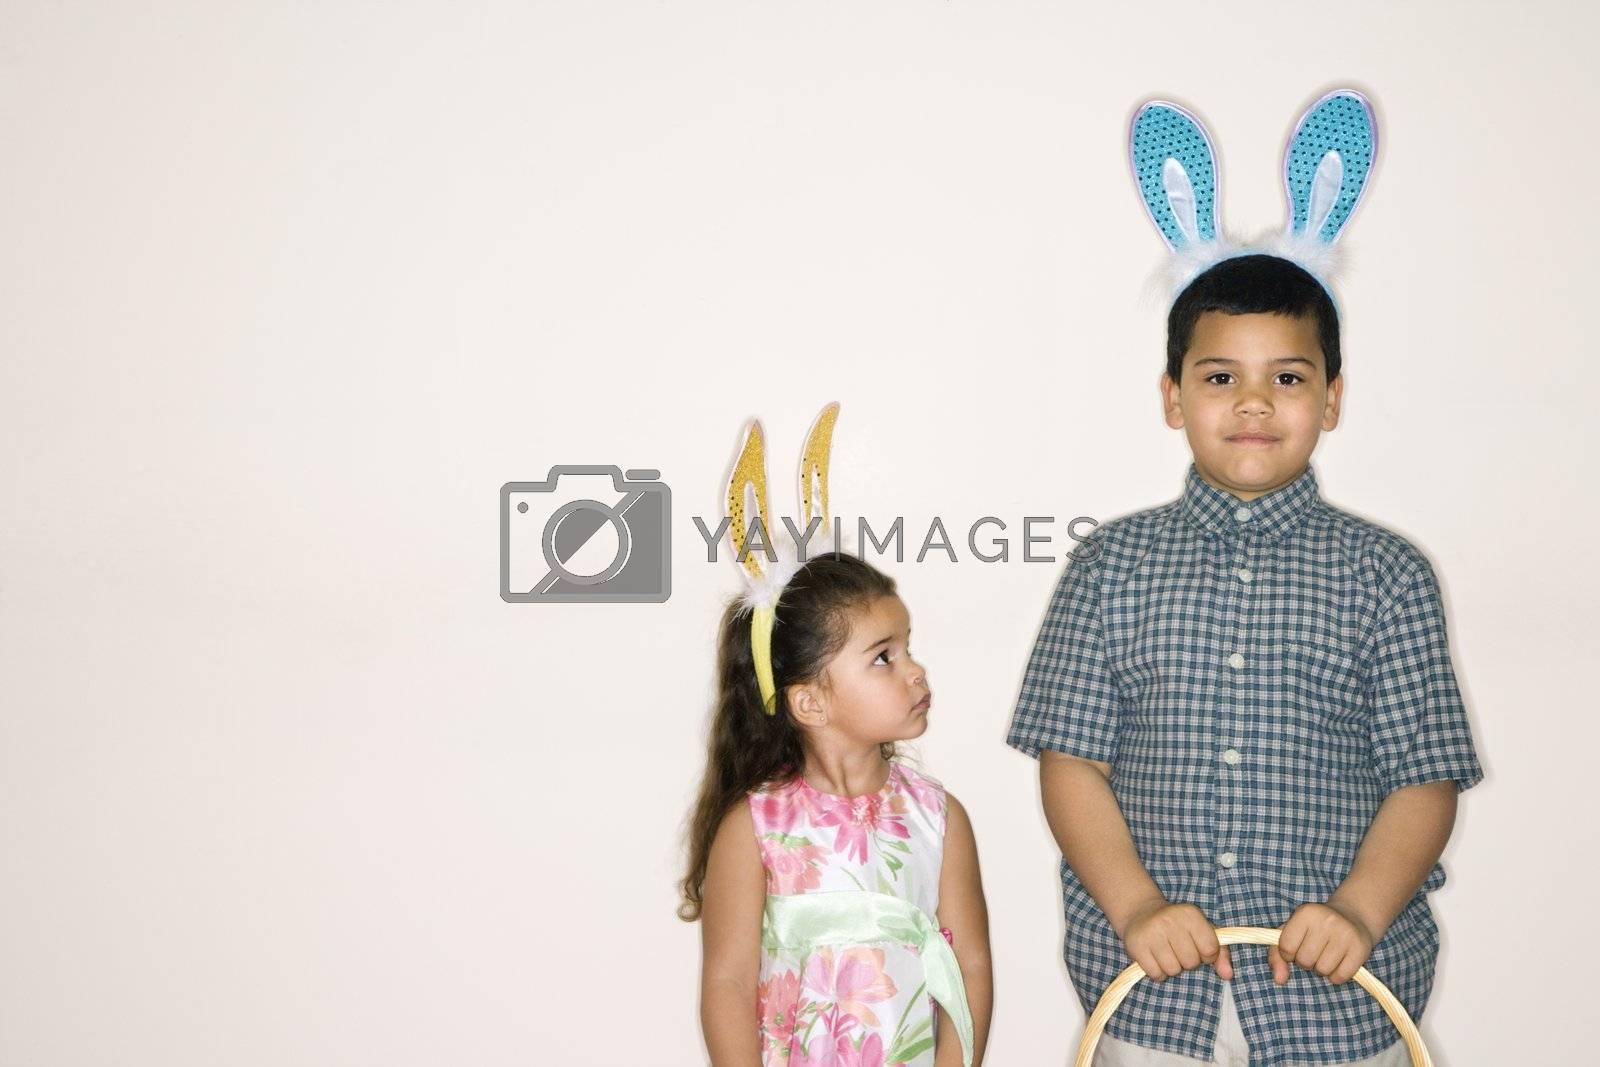 Hispanic girl looking up at Hispanic boy holding Easter basket both wearing bunny ears.